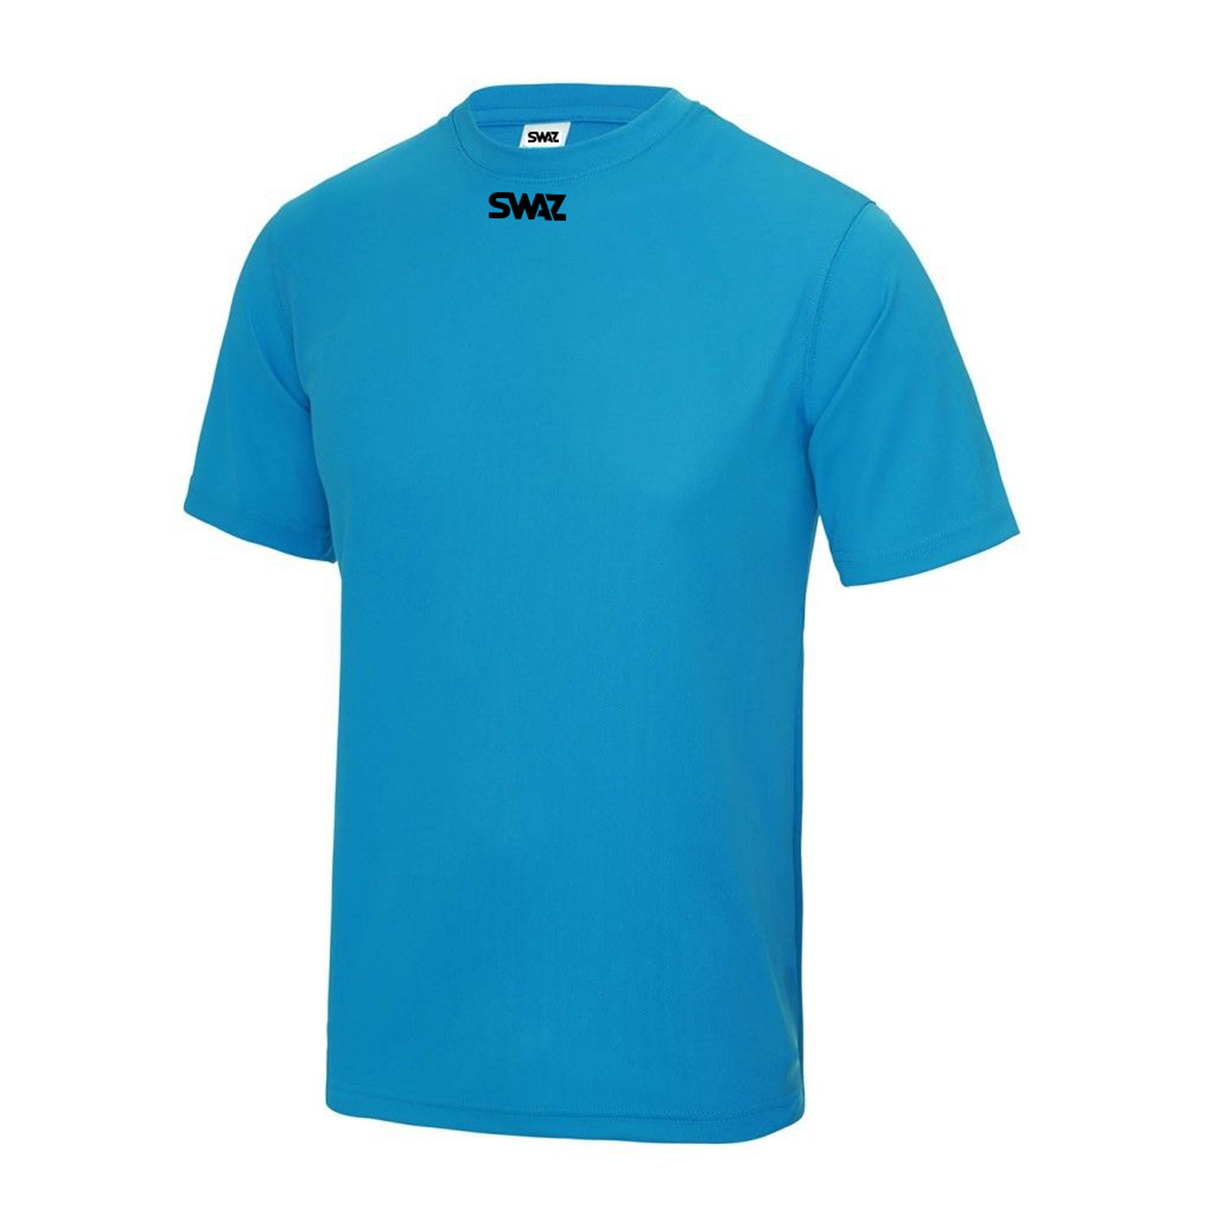 SWAZ Club Training T-Shirt – Sapphire